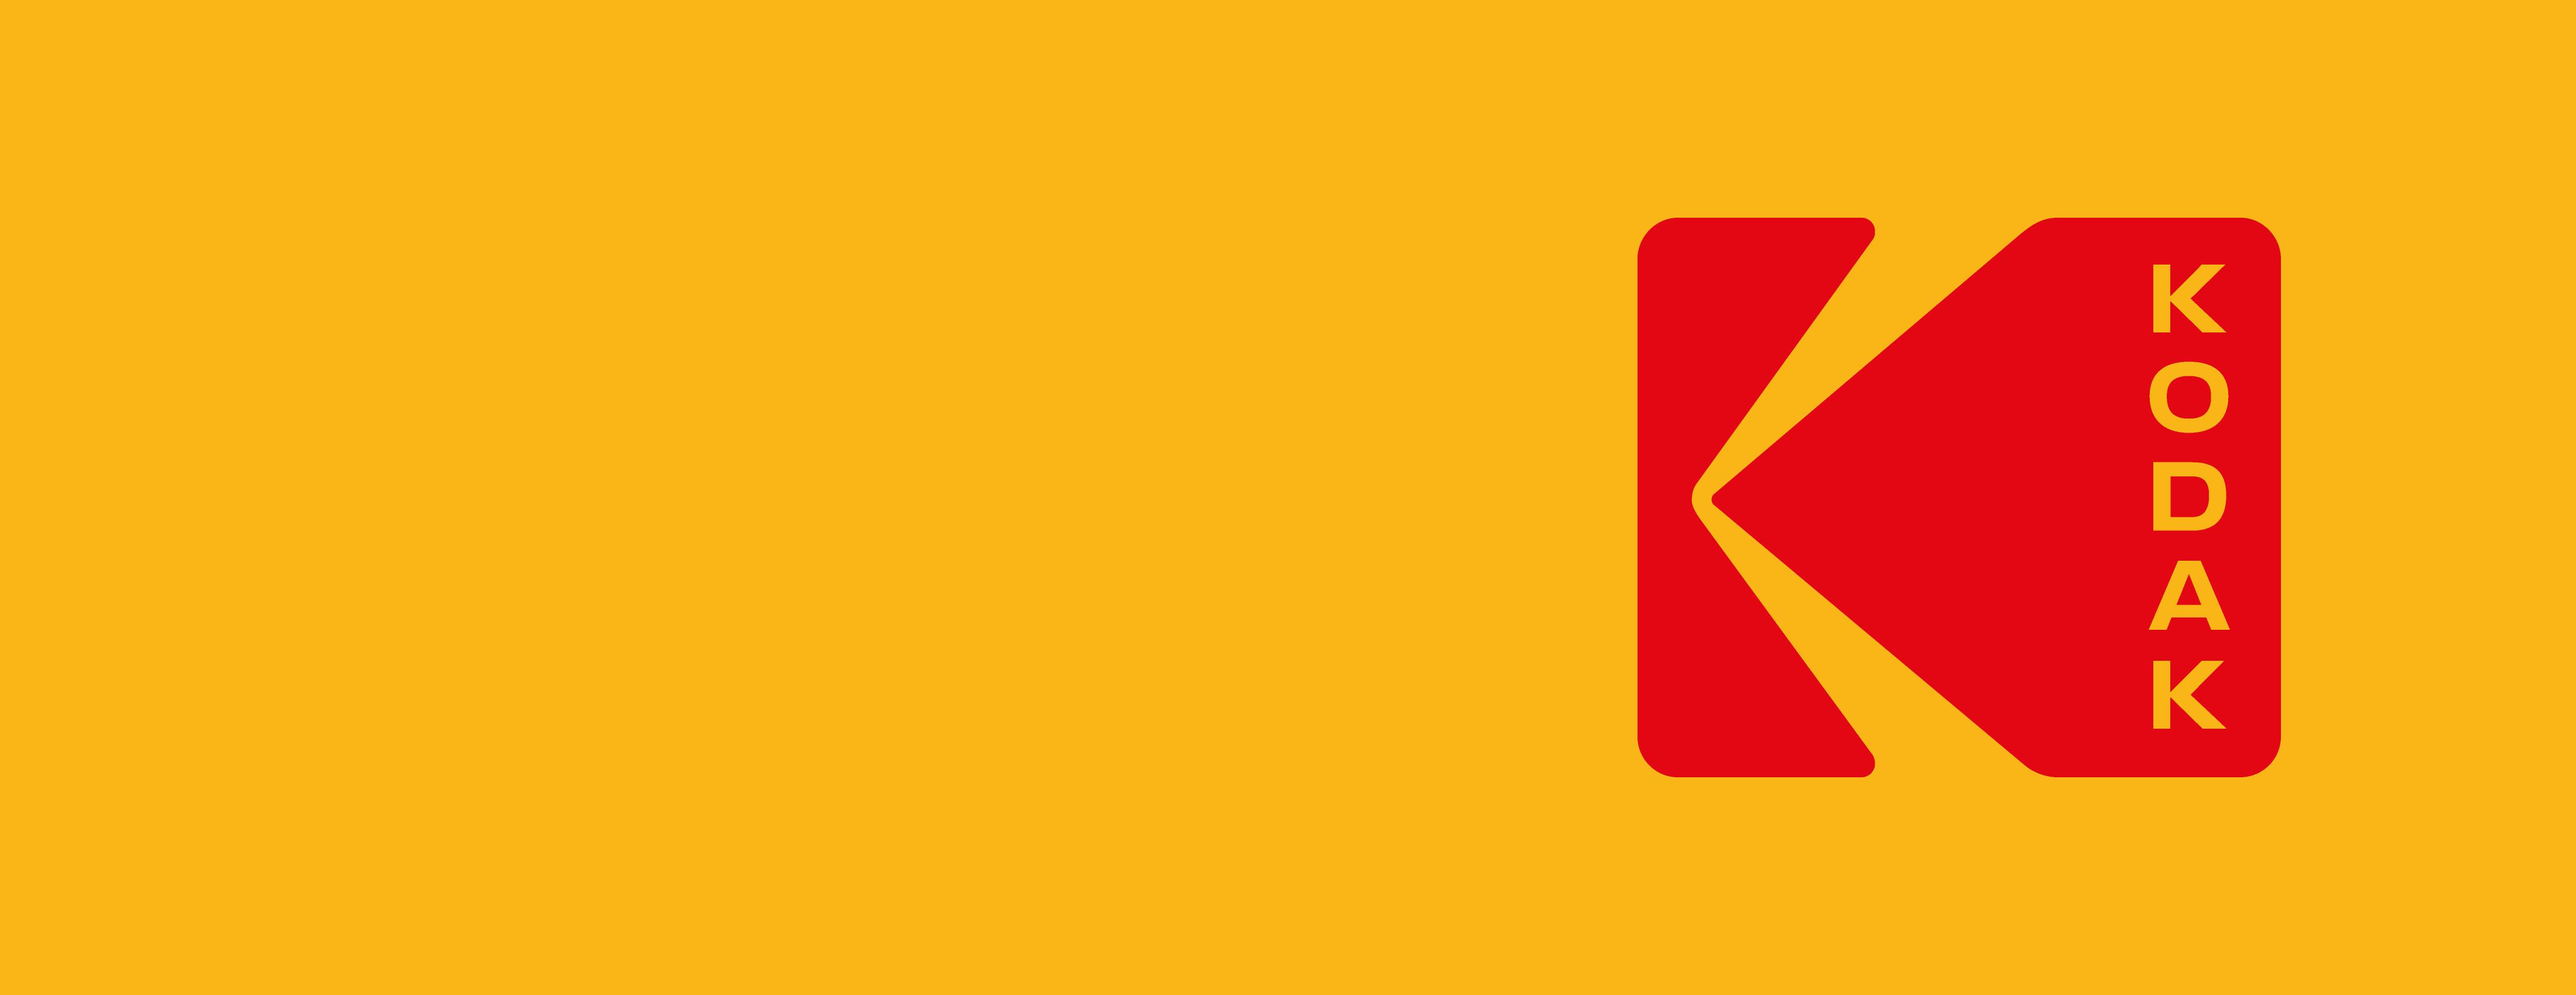 Kodak Clearance